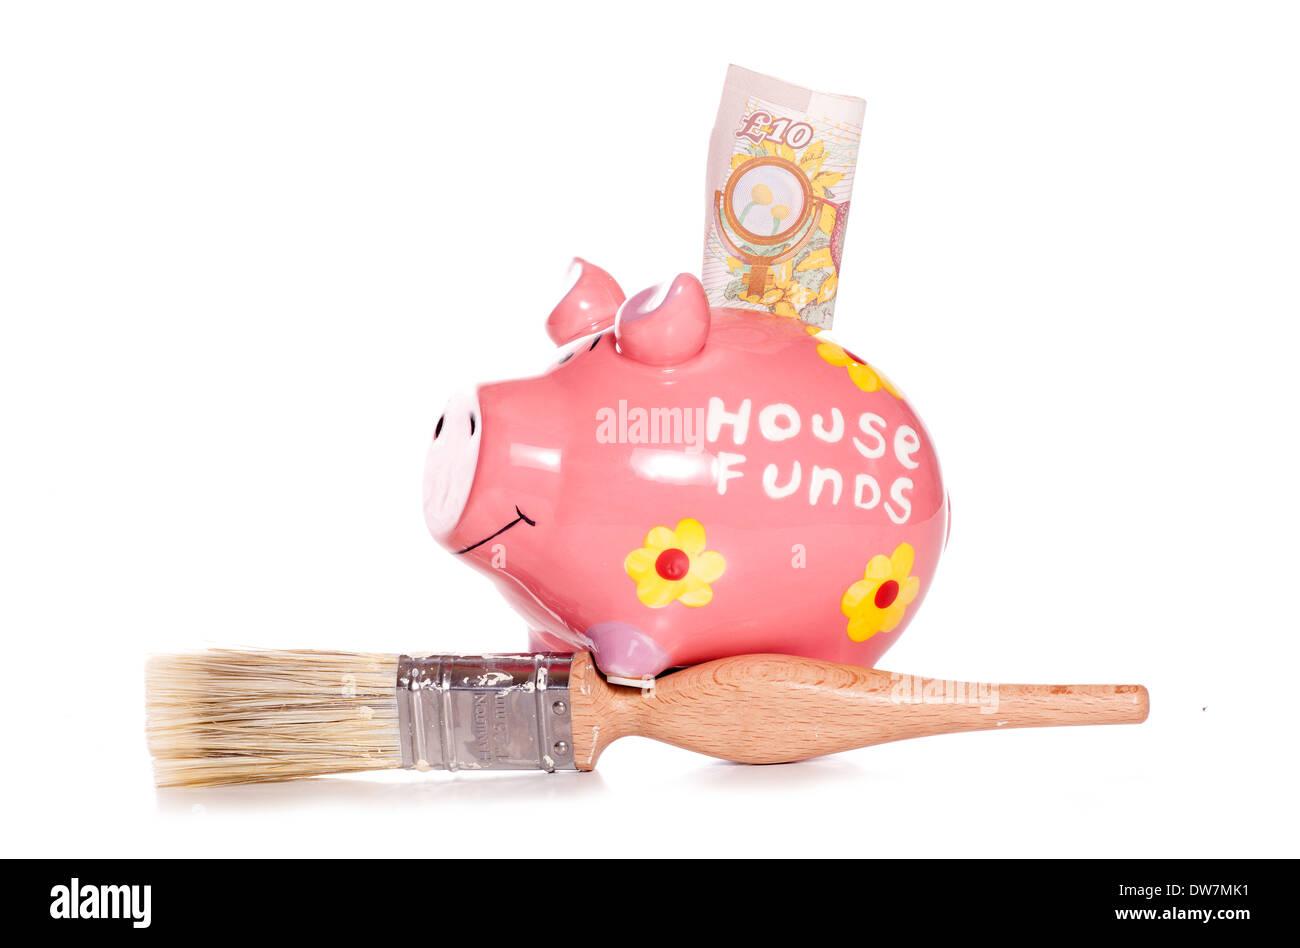 DIY house funds studio cutout - Stock Image